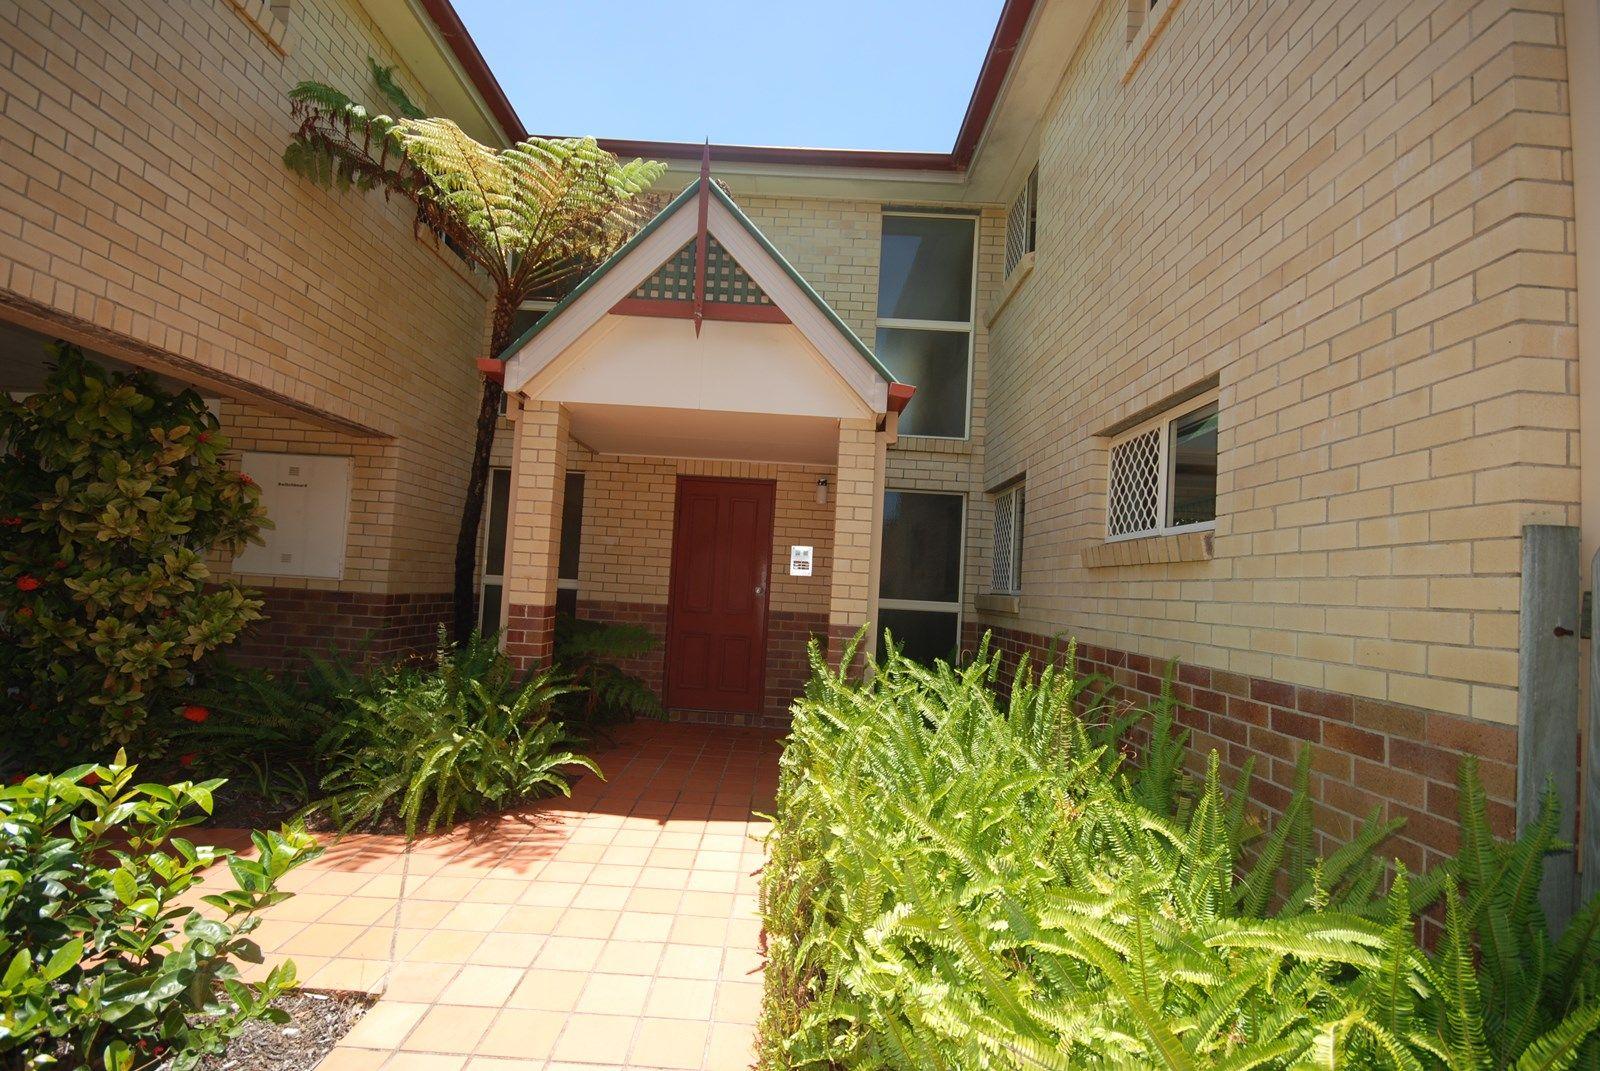 2/133 Ryans Road, Nundah QLD 4012, Image 1